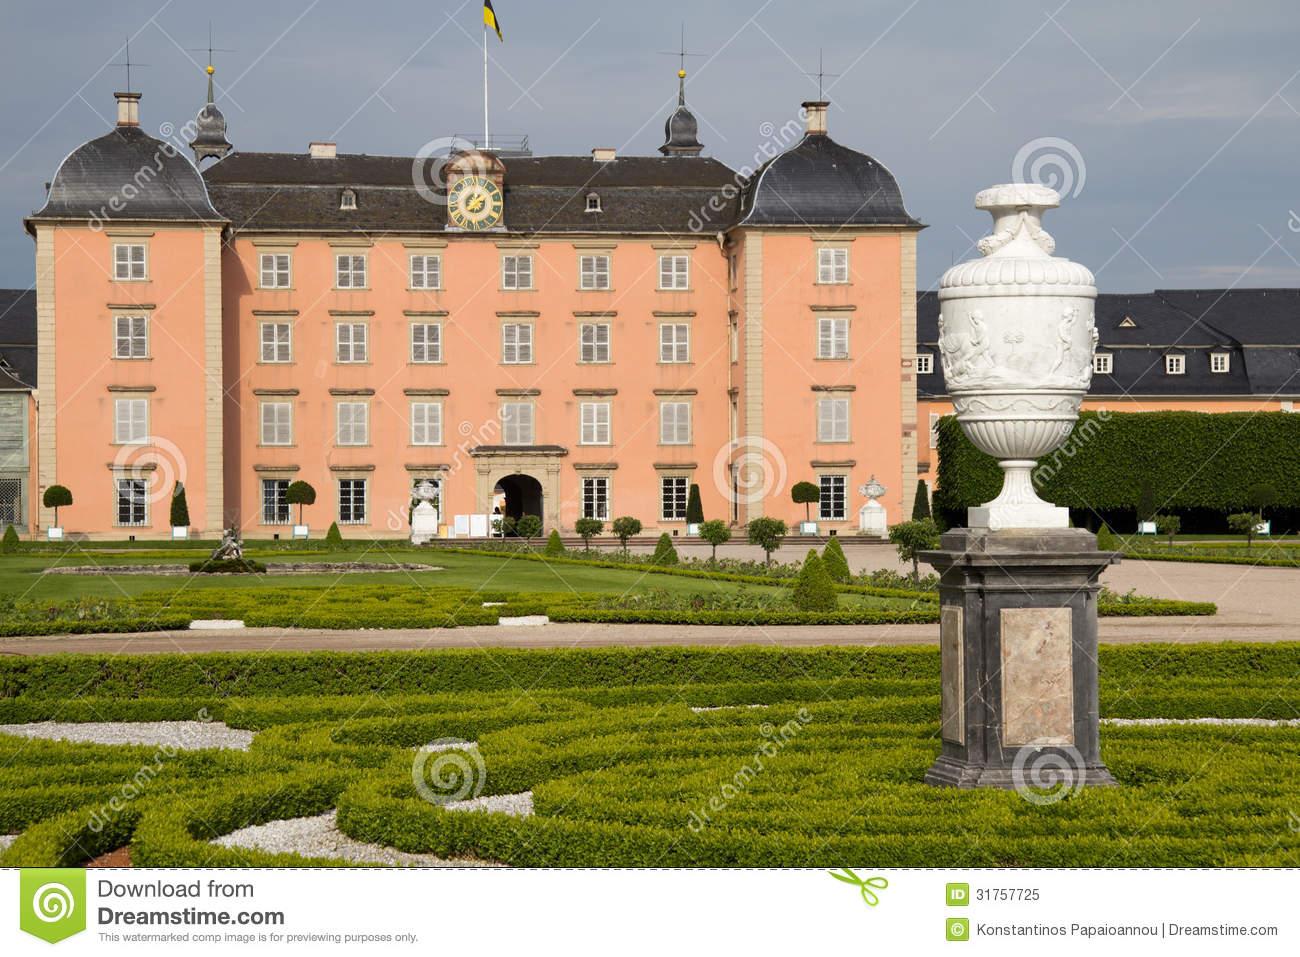 Schwetzingen Castle In Mannheim, Germany Royalty Free Stock Photo.